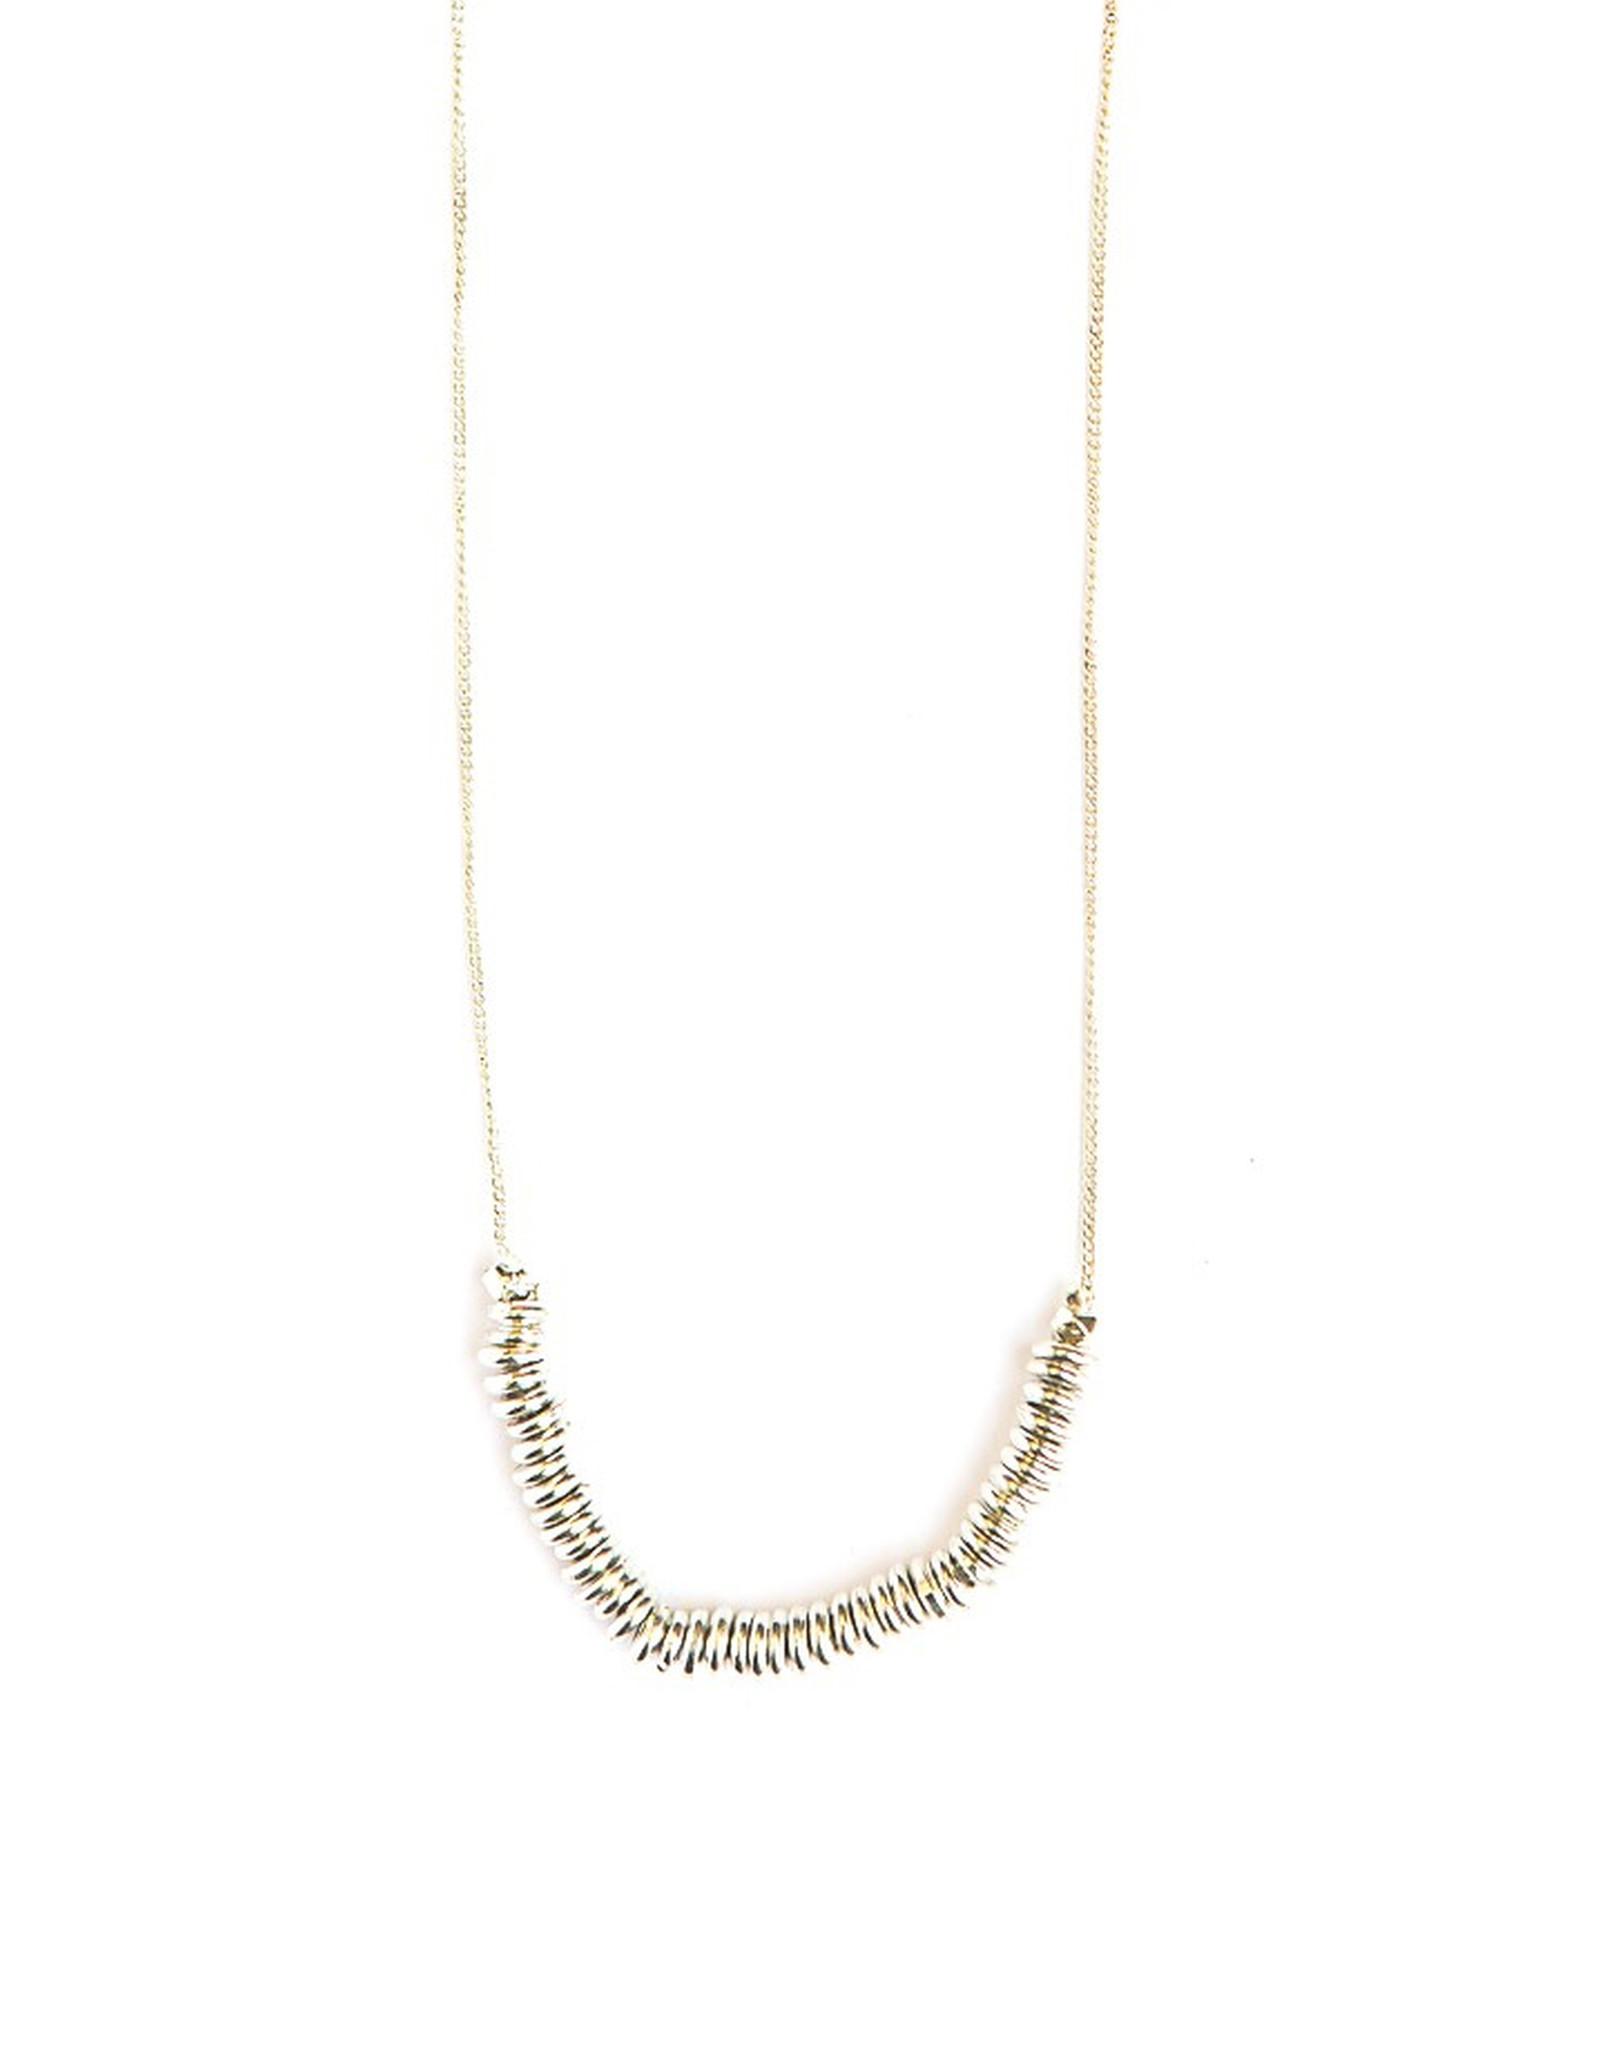 Delicate Discs Necklace